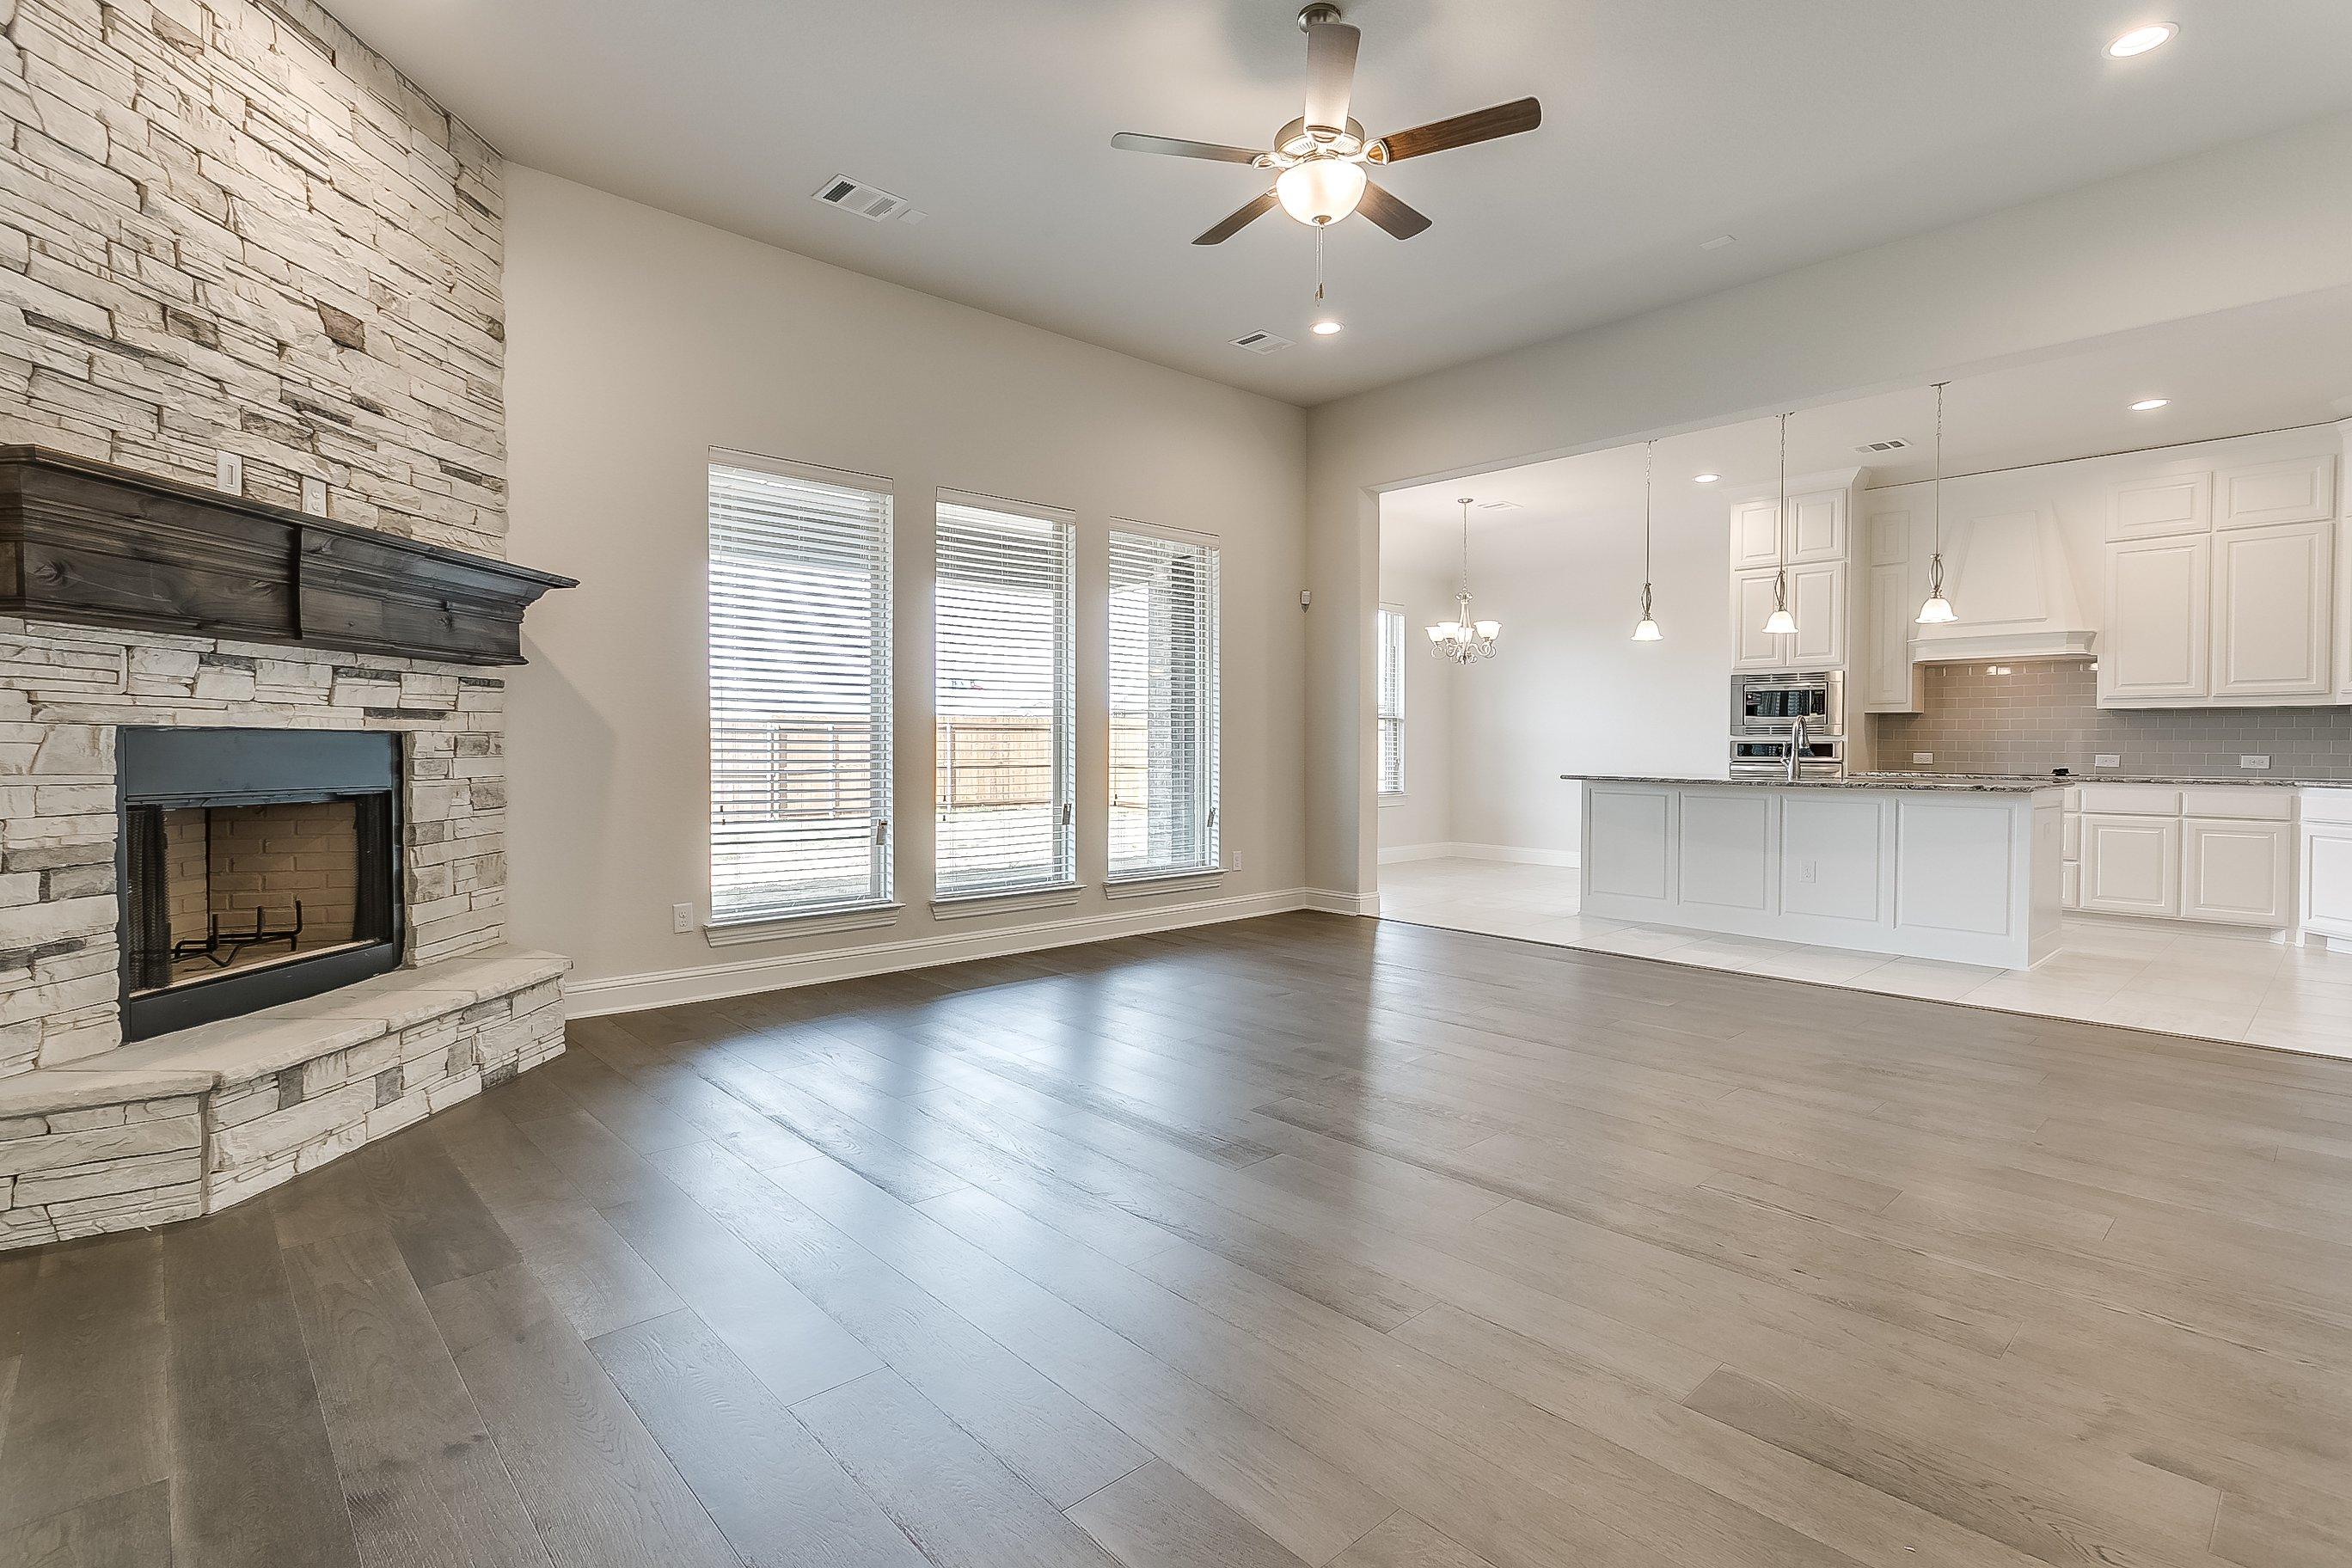 1113 Autumn Trail - John Houston Custom Homes - Fireplace, Living Room, Kitchen, Wood Floors